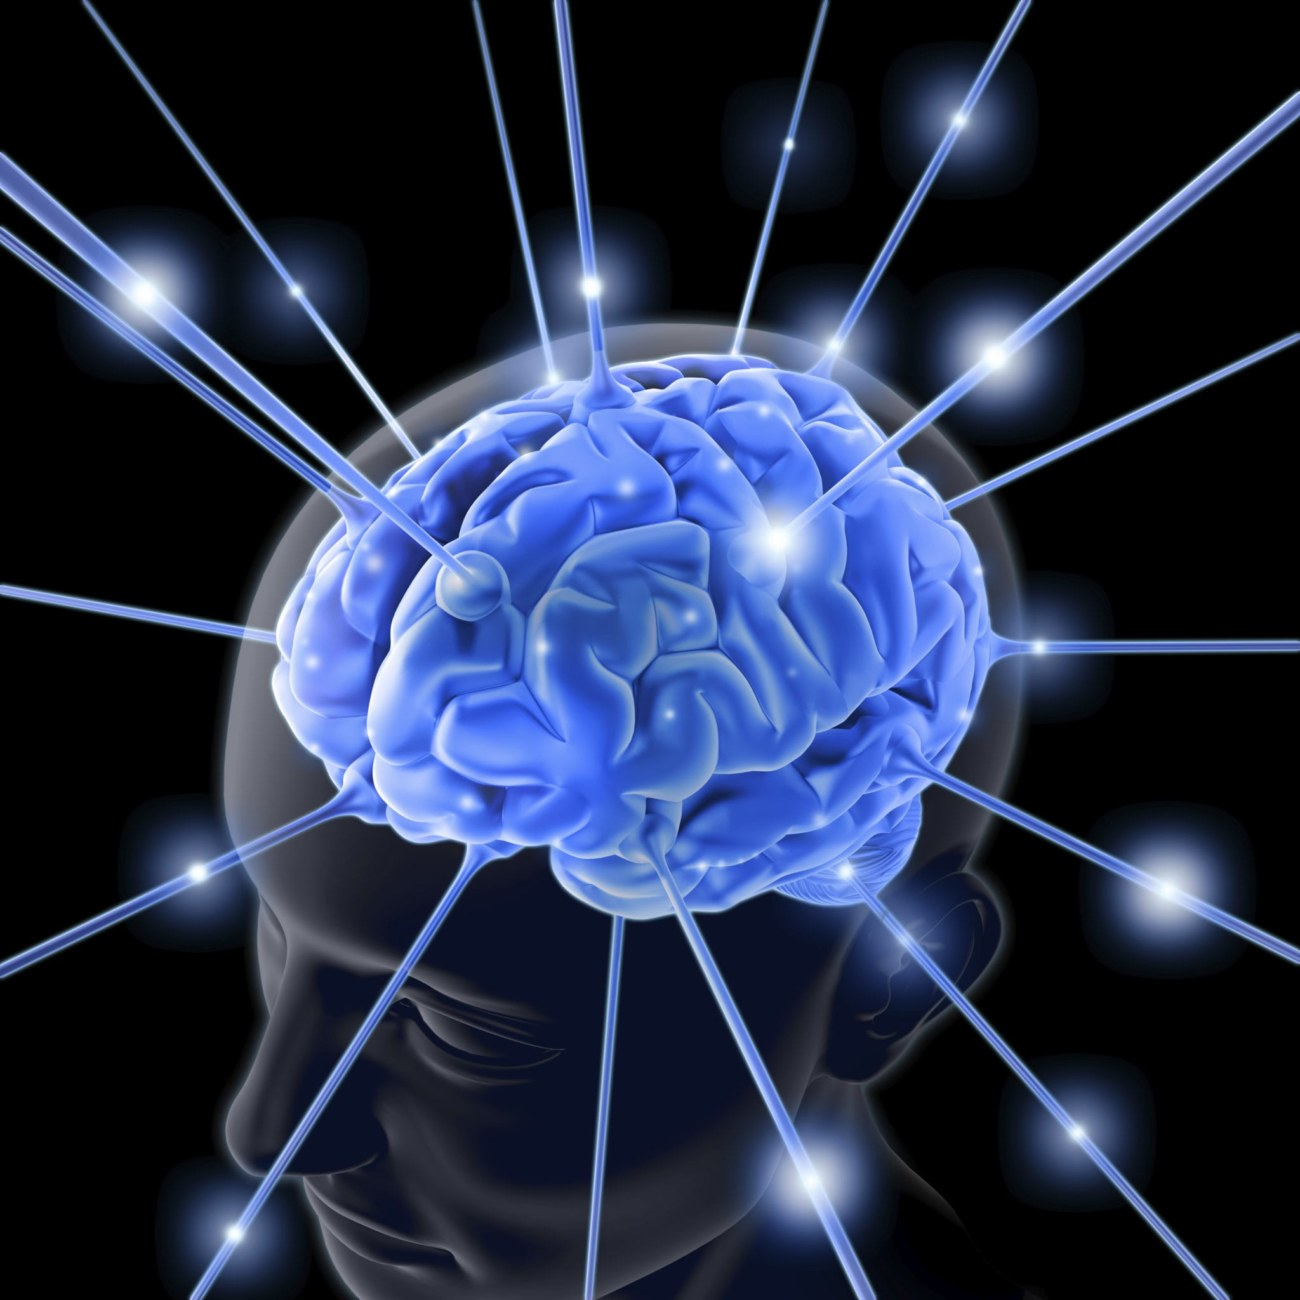 Terapia quântica curativa